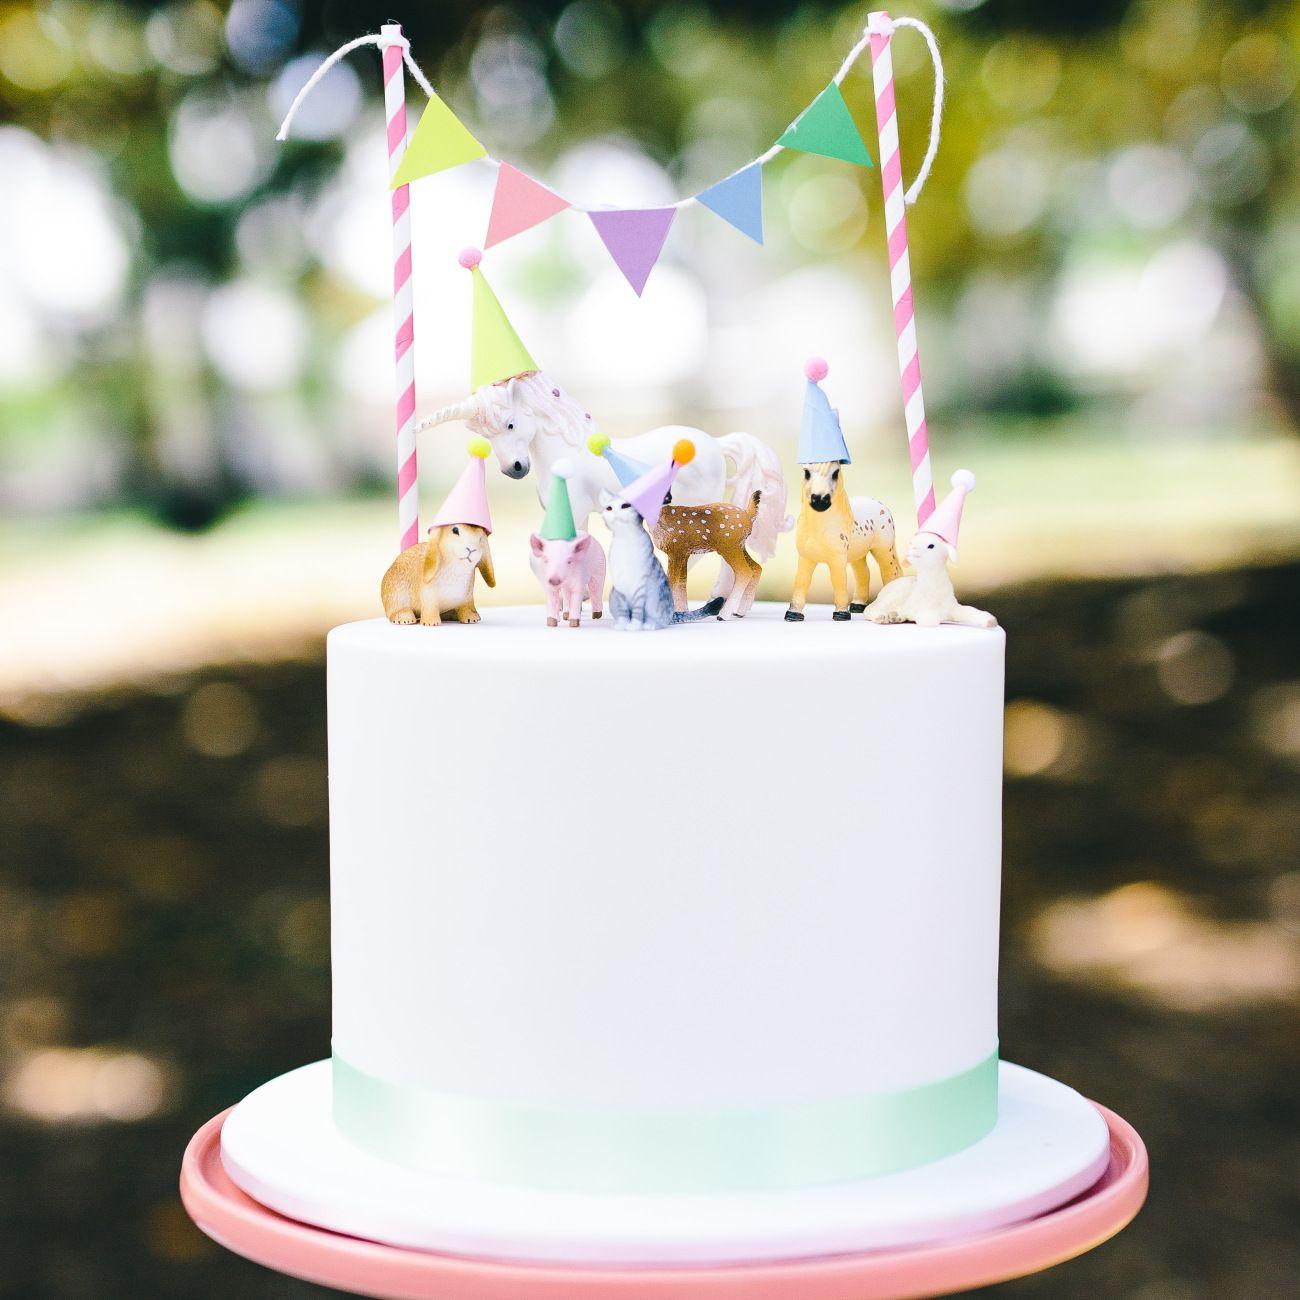 Pin By Dj Peter On 21st Birthdays Cake Pinterest Animal Birthday